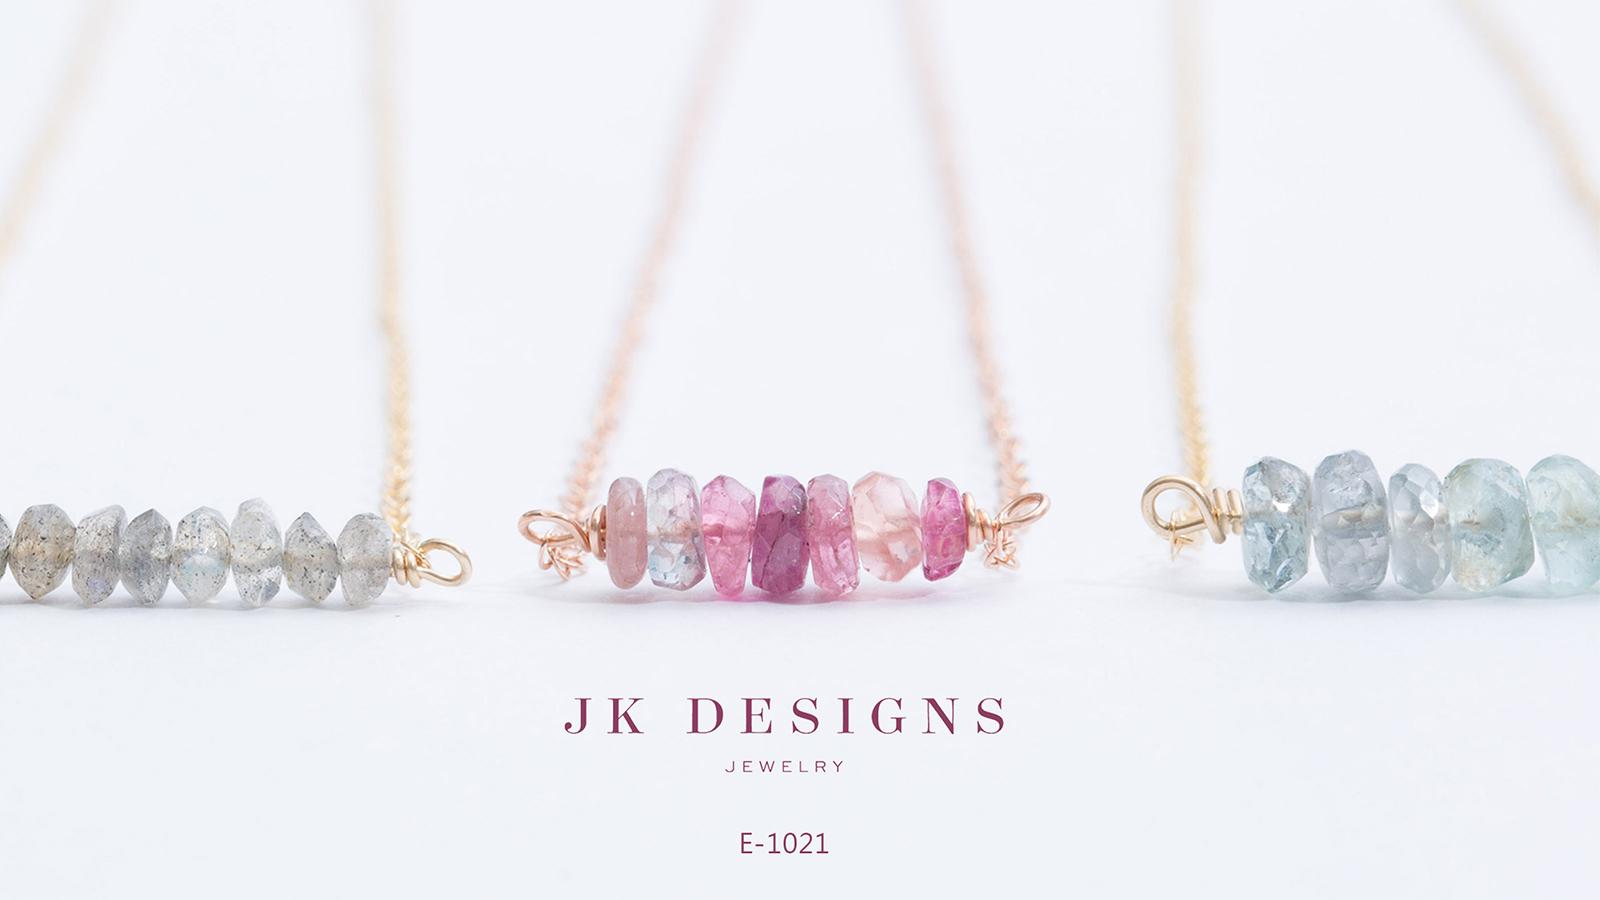 JK Designs